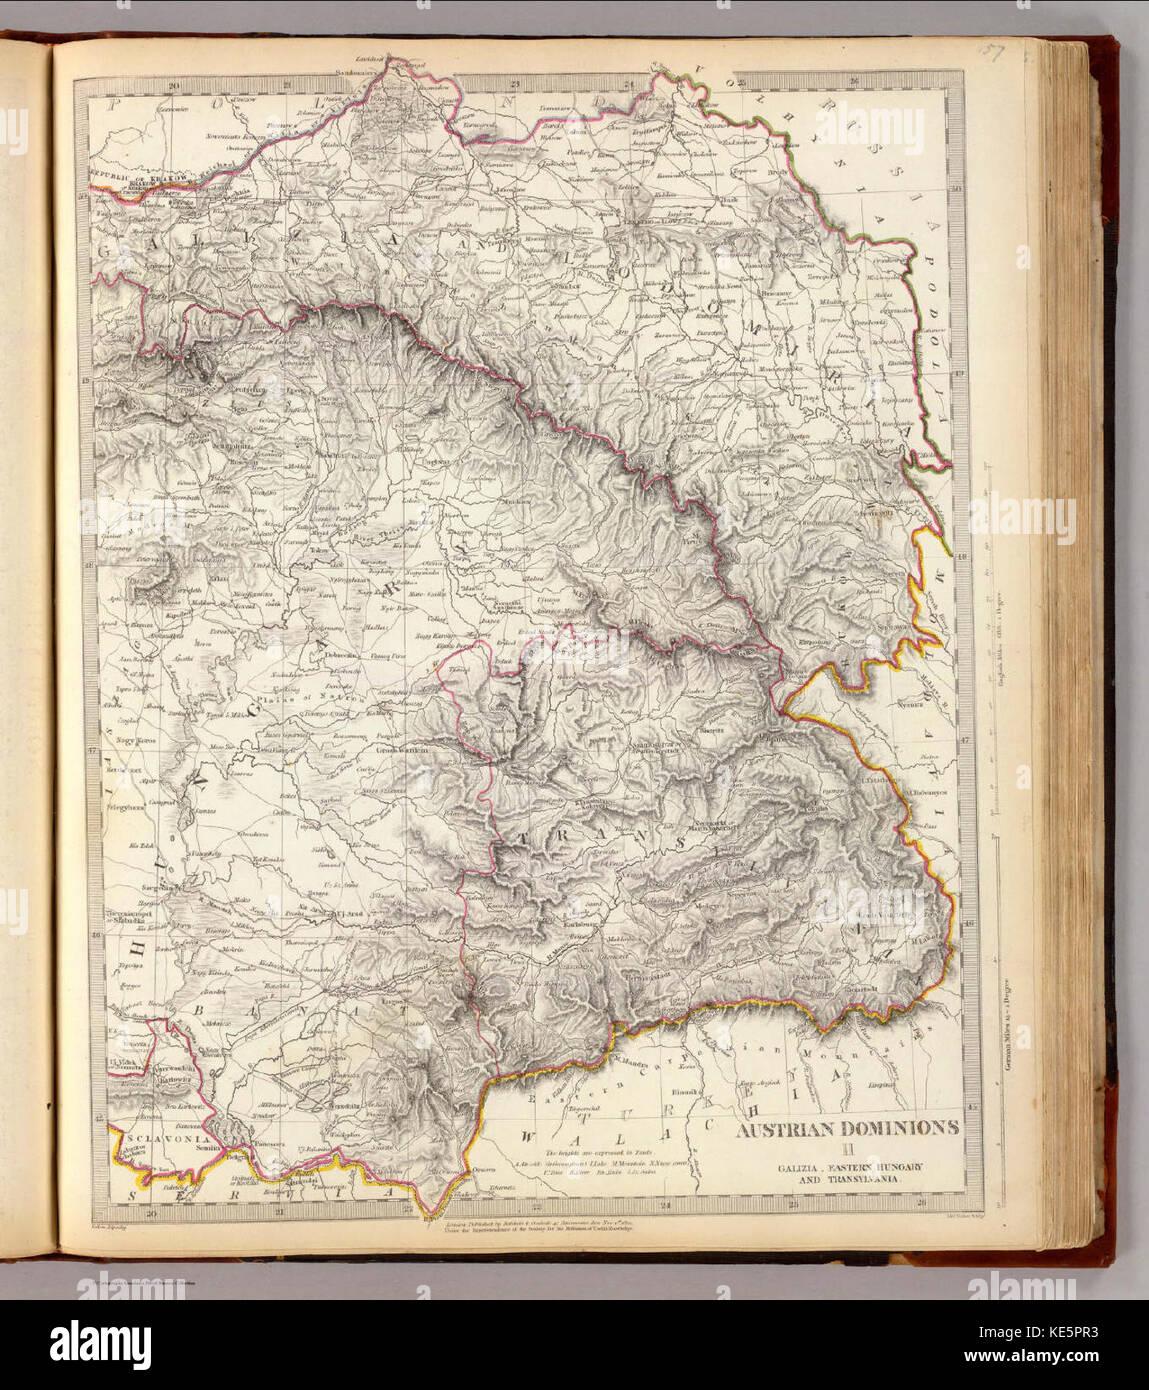 Austrian Dominions Galicia,Eastern Hungary, Transylvania